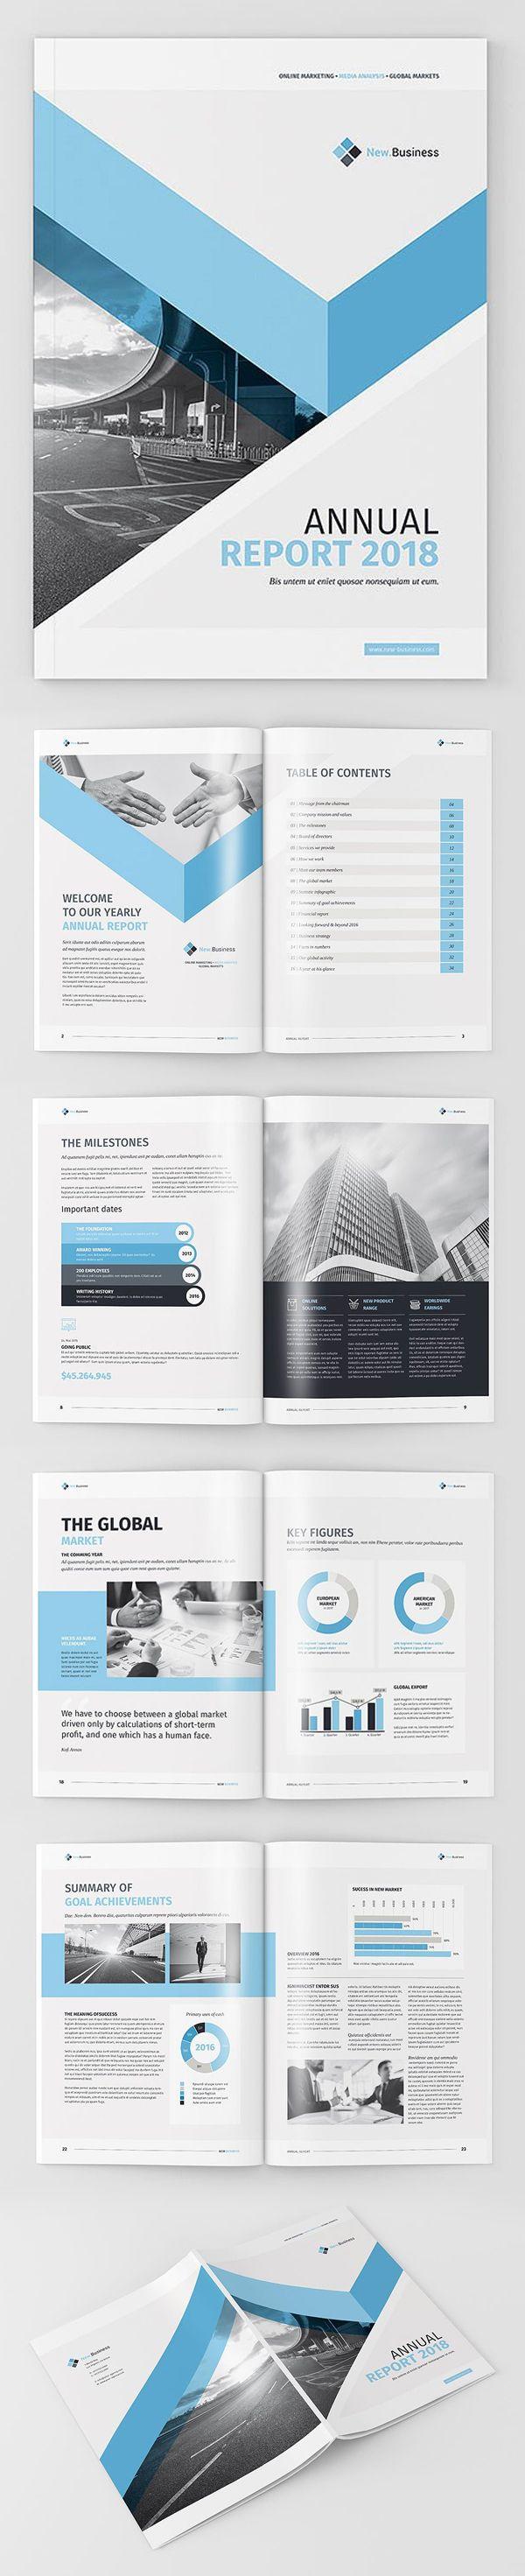 Professional Annual Report 2018 Template #brochuretemplate #catalogdesign #booklet #annualreport #printdesign #psdtemplate